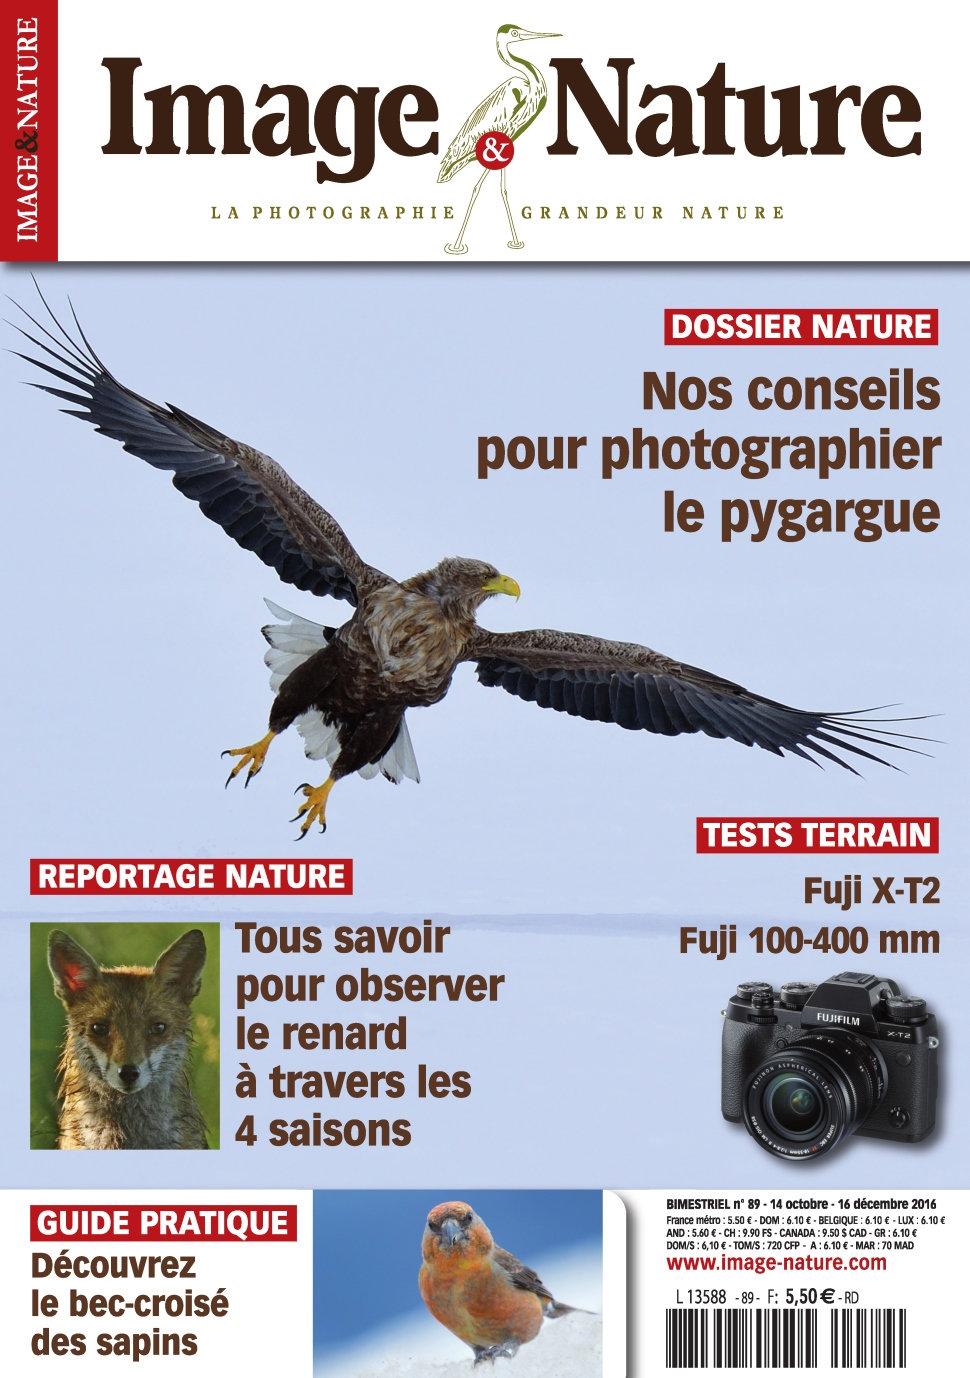 Image et Nature N°89 - Octobre/Novembre 2016